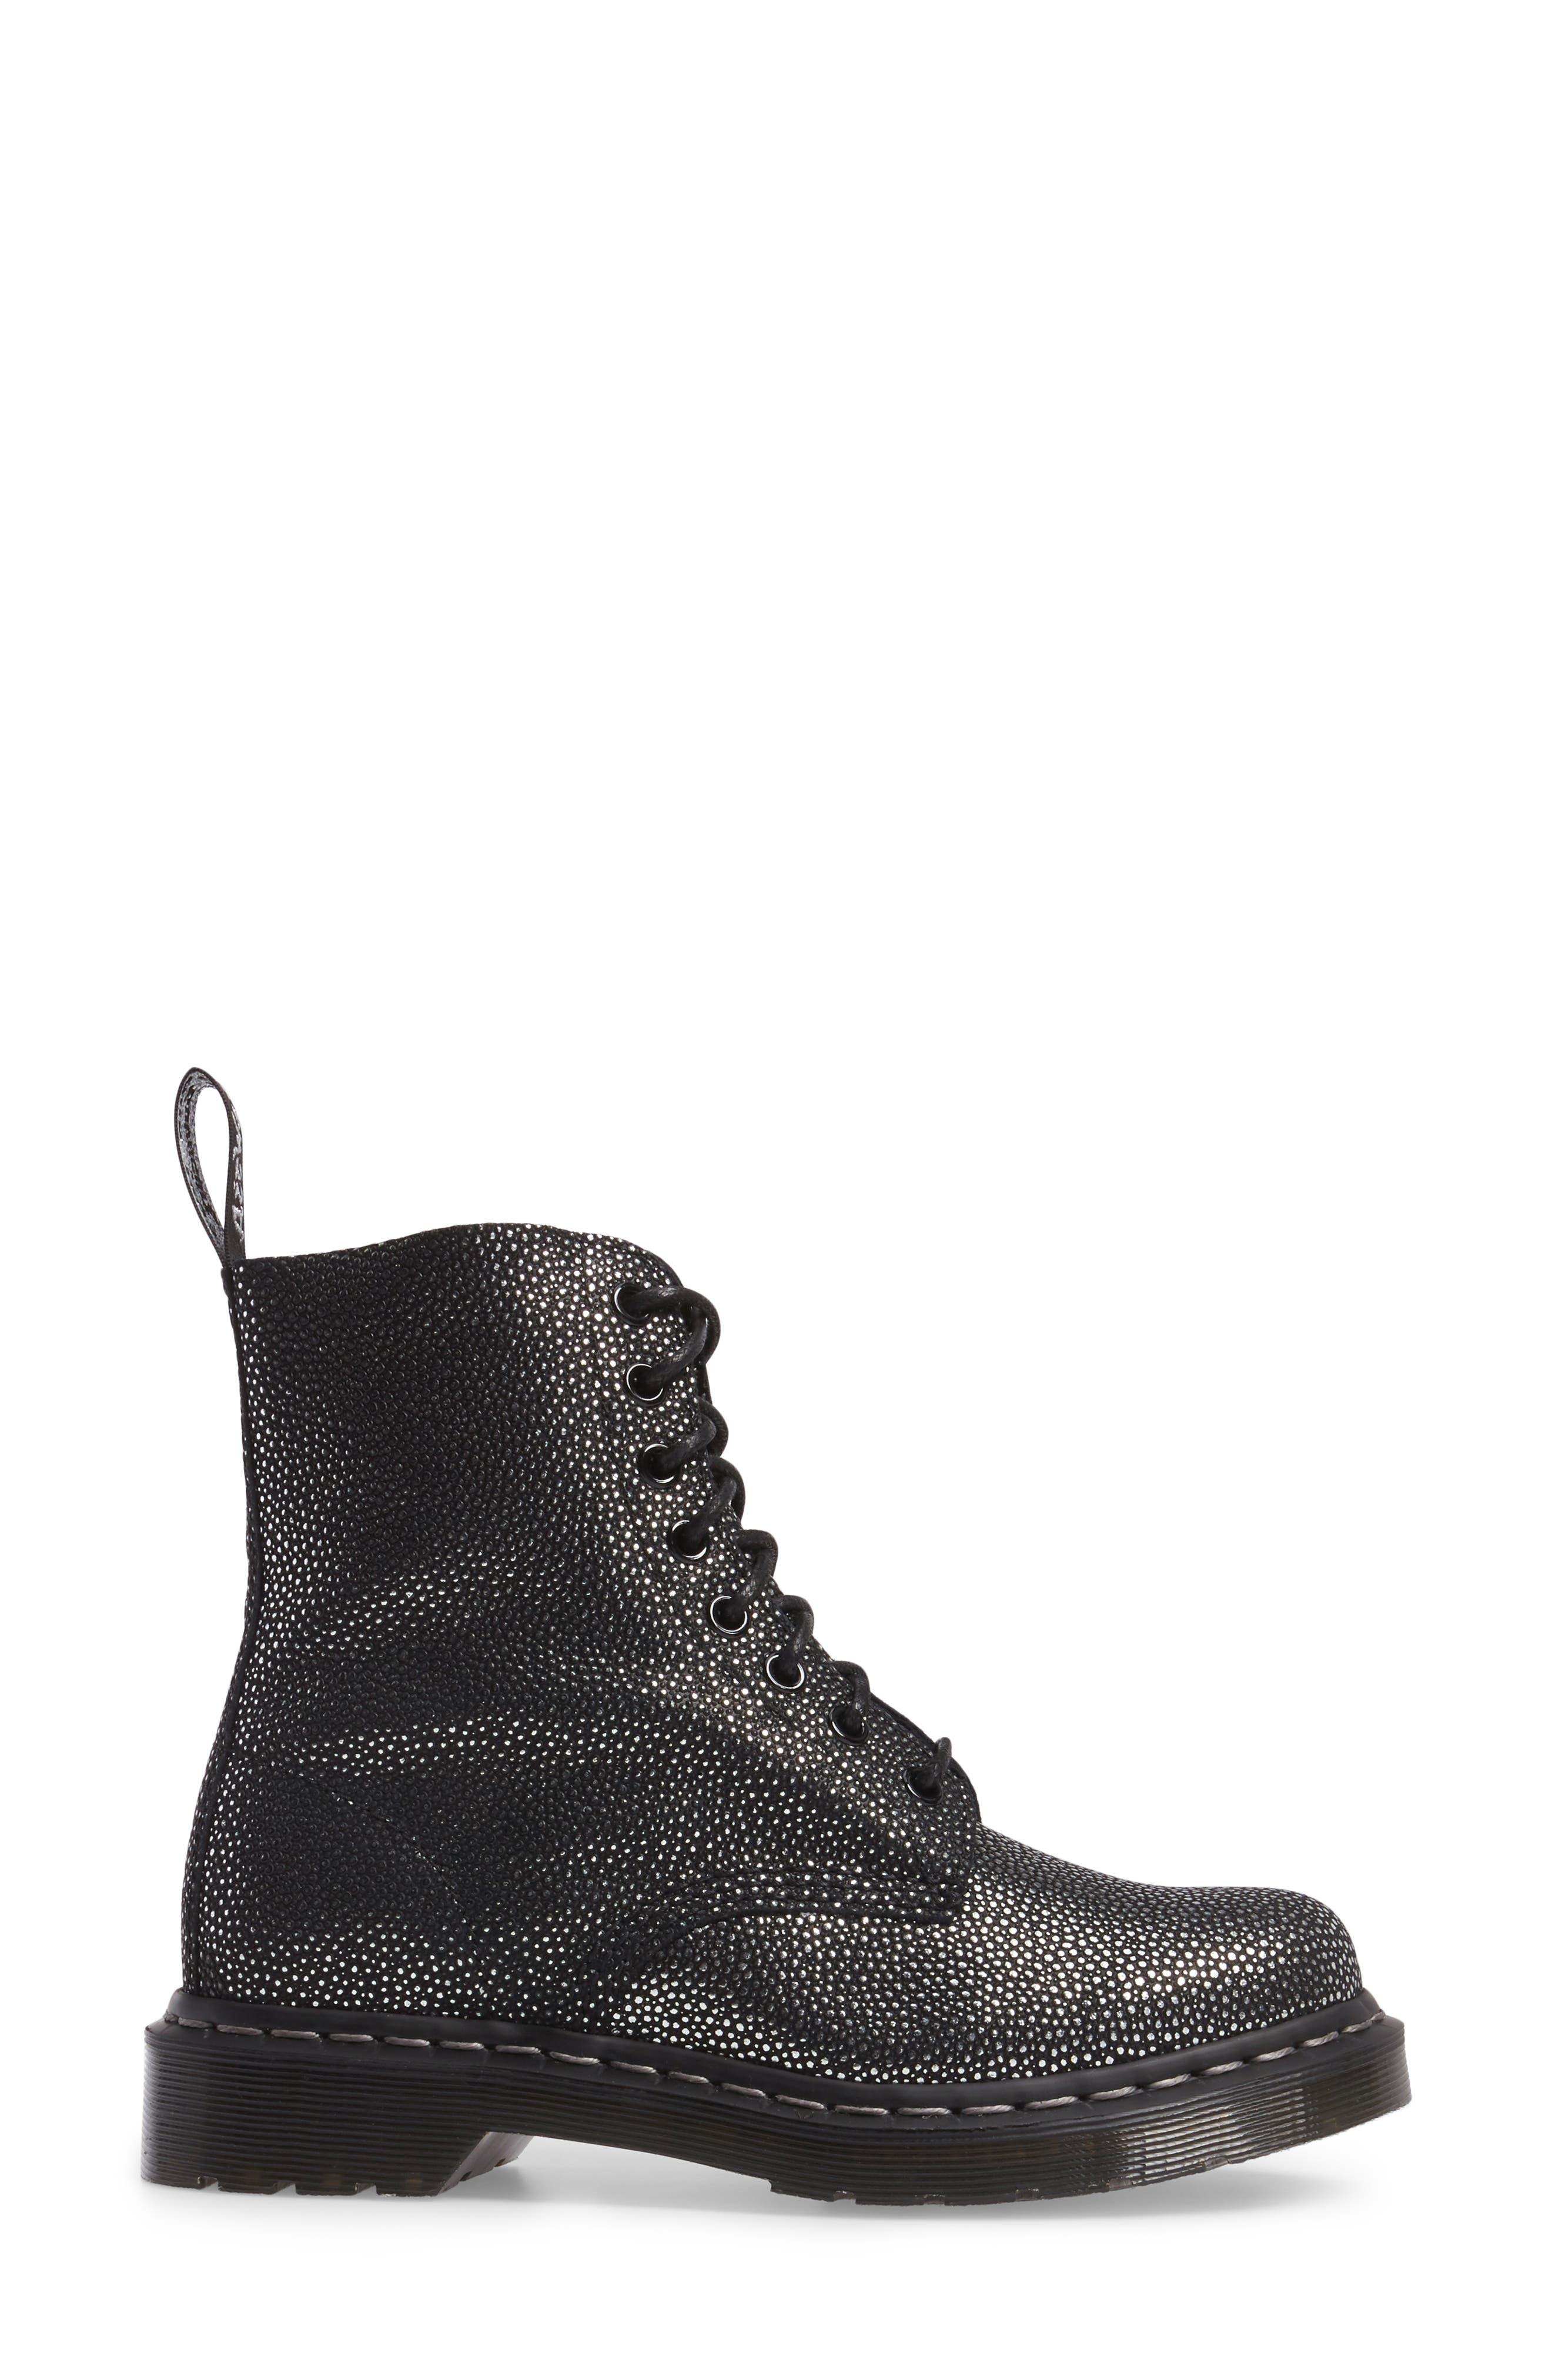 1460 Boot,                             Alternate thumbnail 3, color,                             040